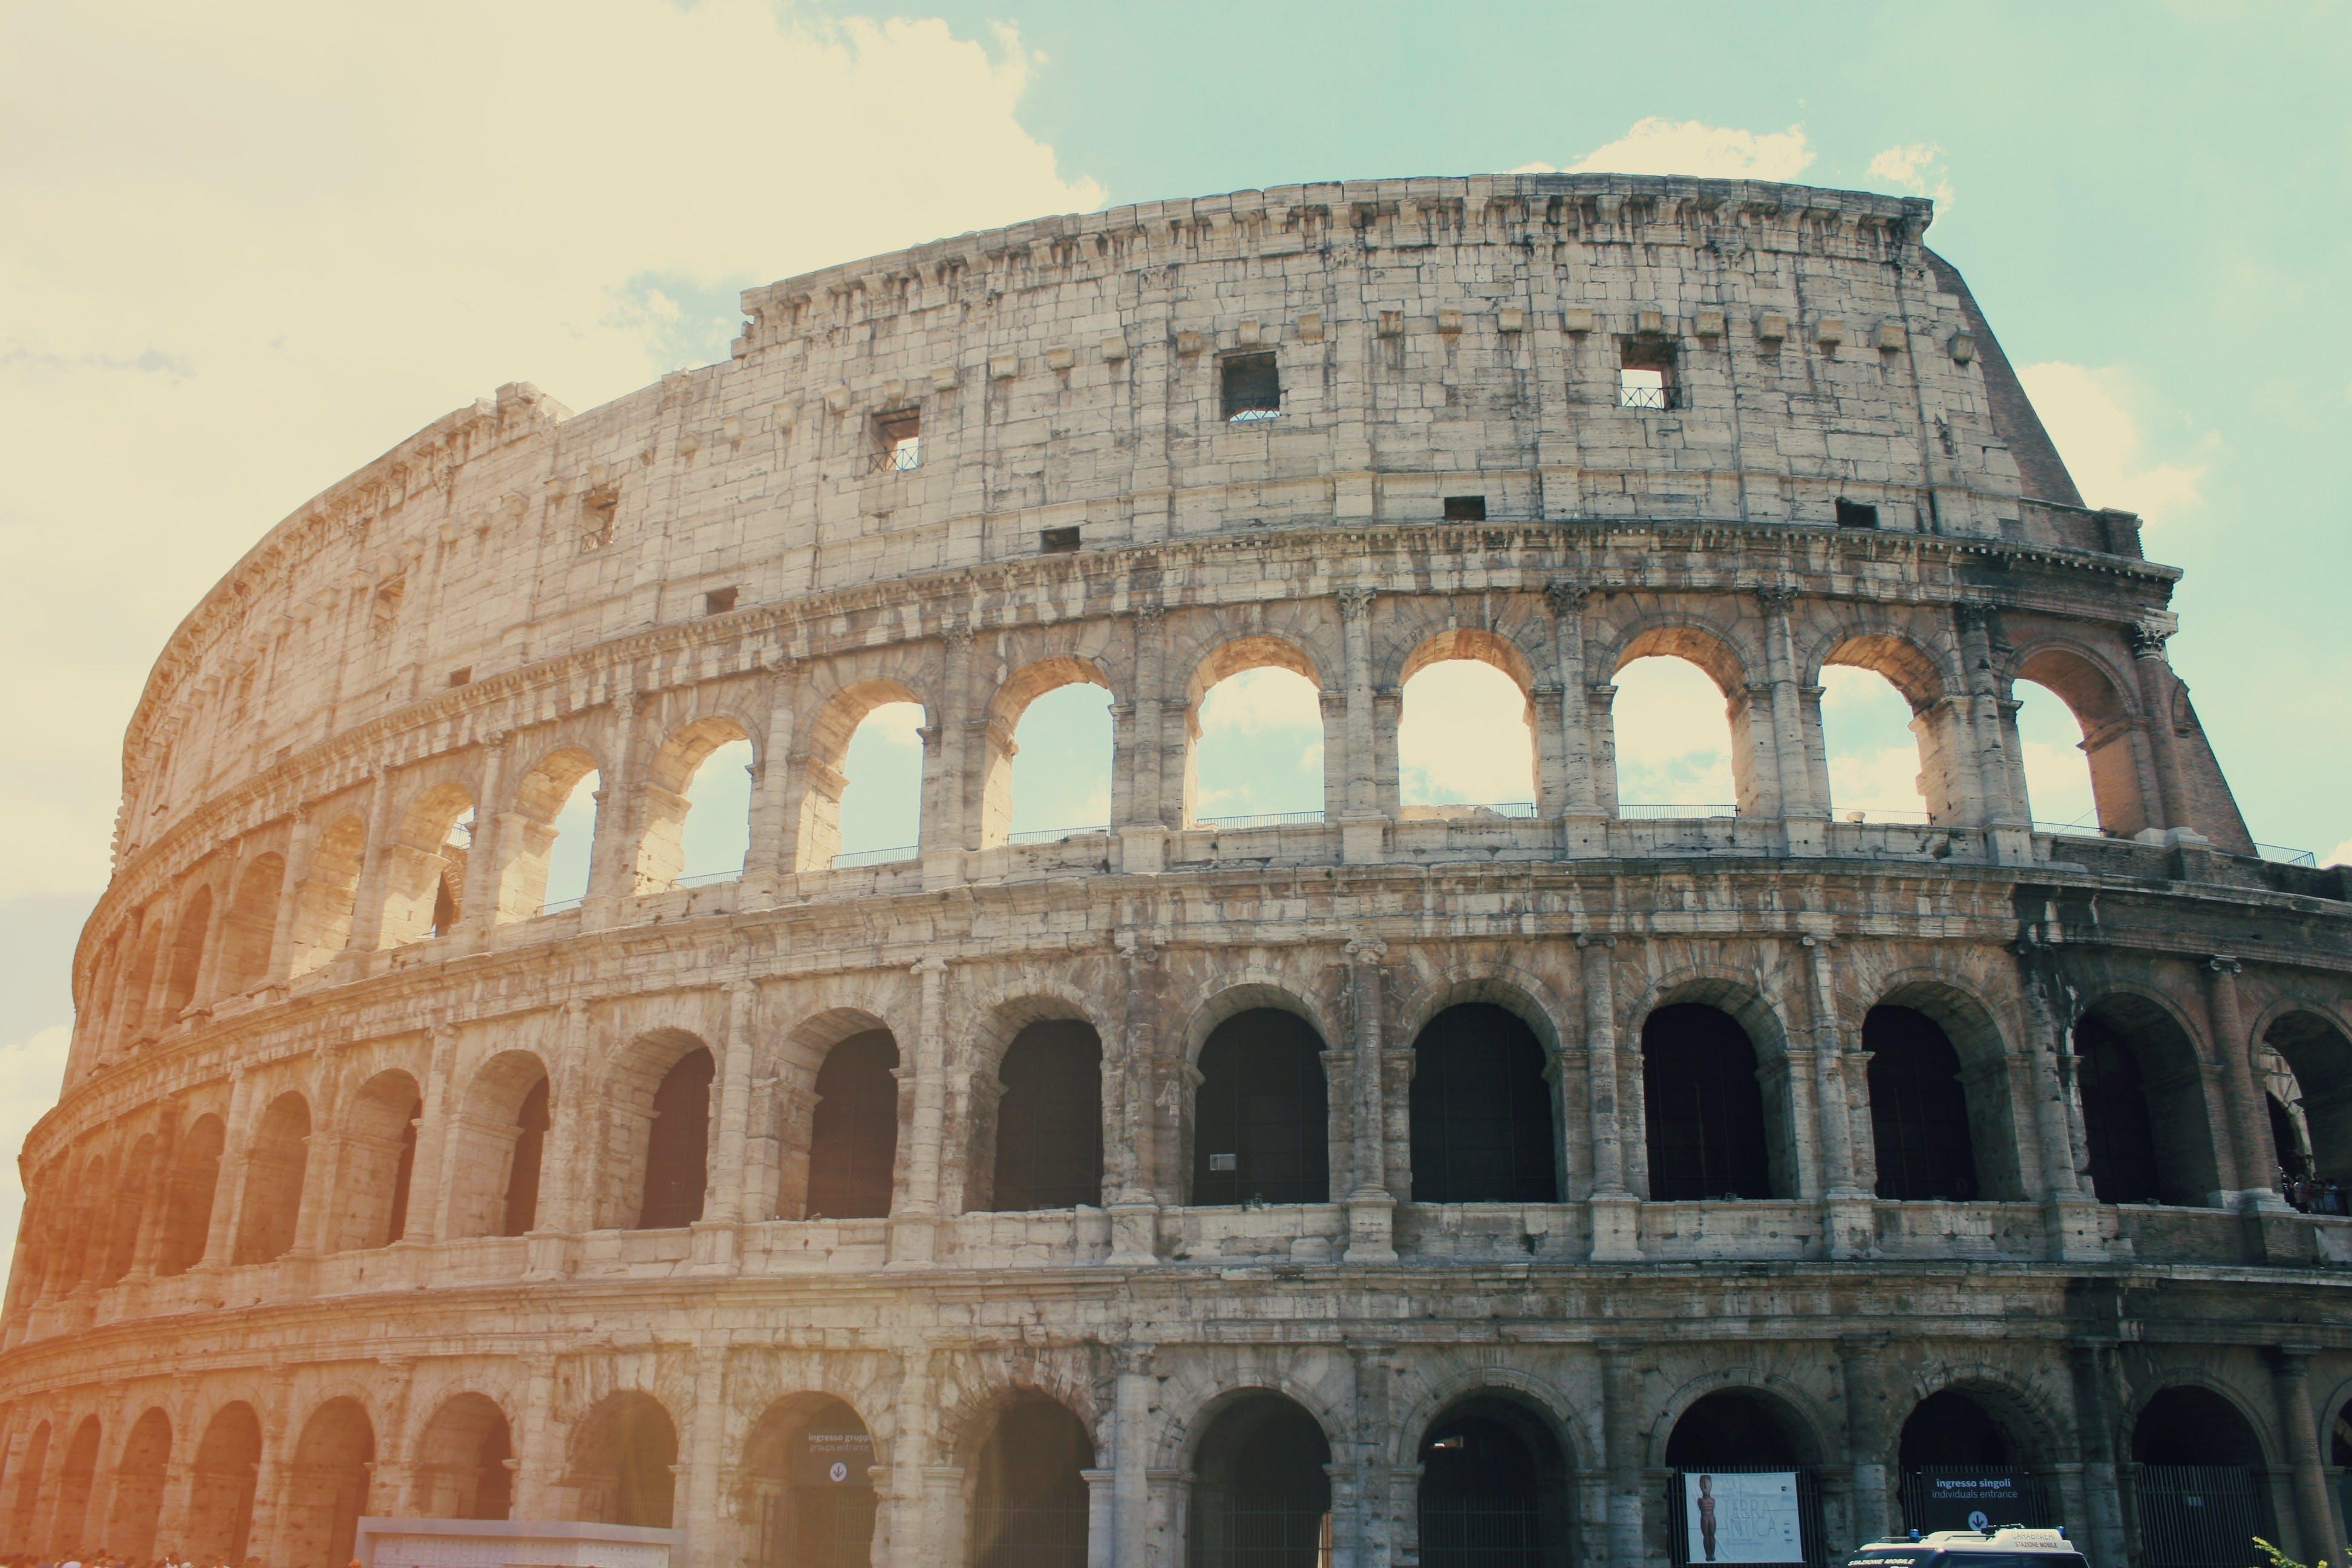 efterårsferie arkitektur rom italien kultur ferie